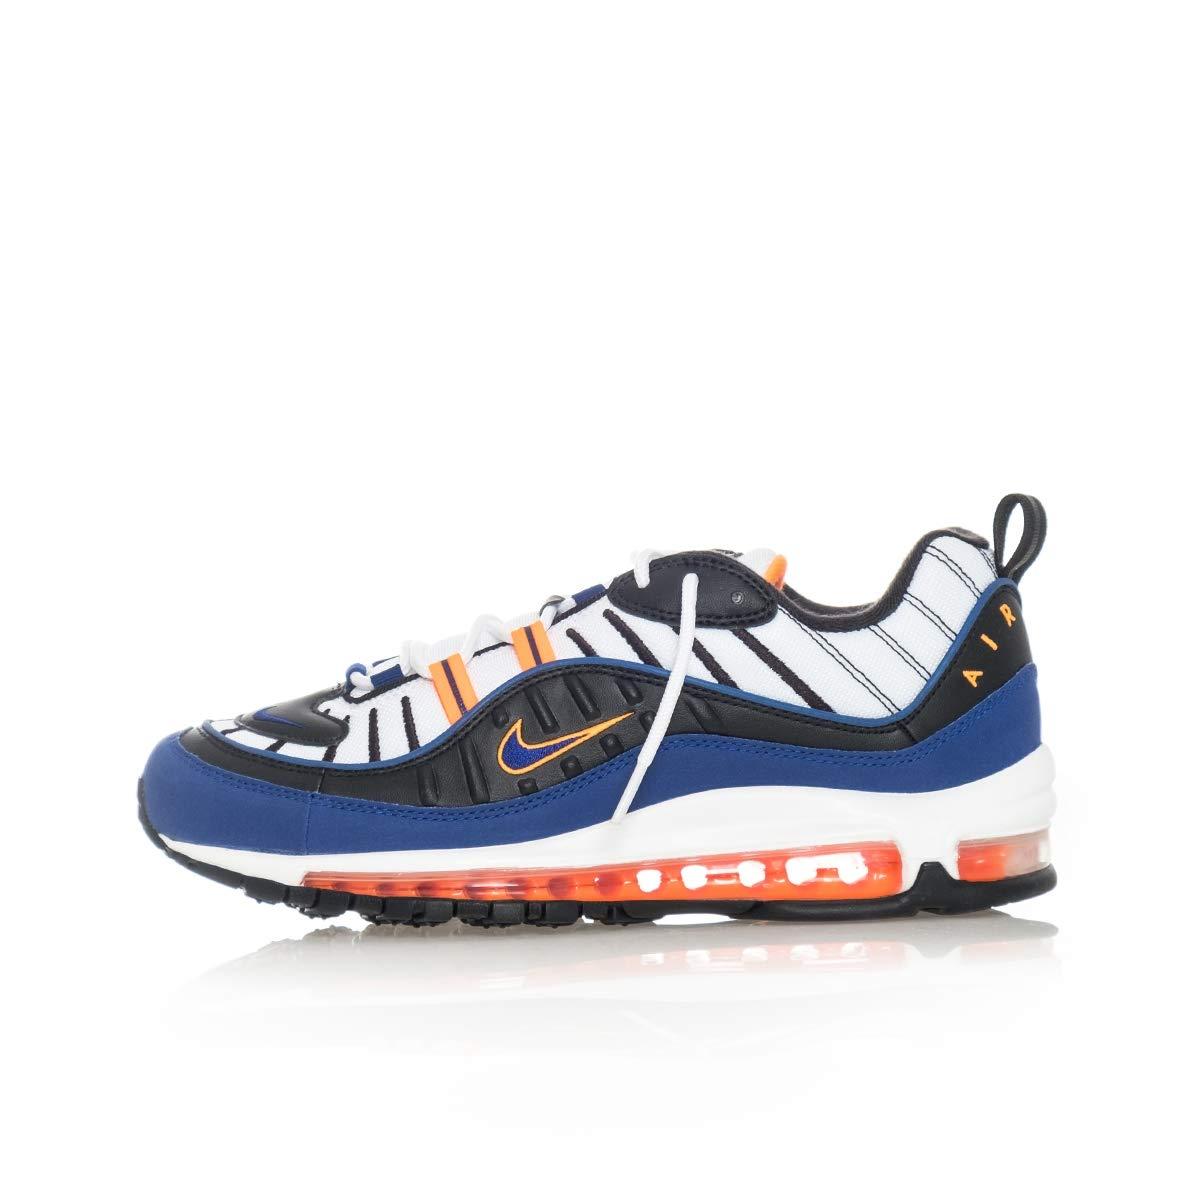 Vit - djup Royale blå Nike skor herrar AIR MAX 98 CD1536.100